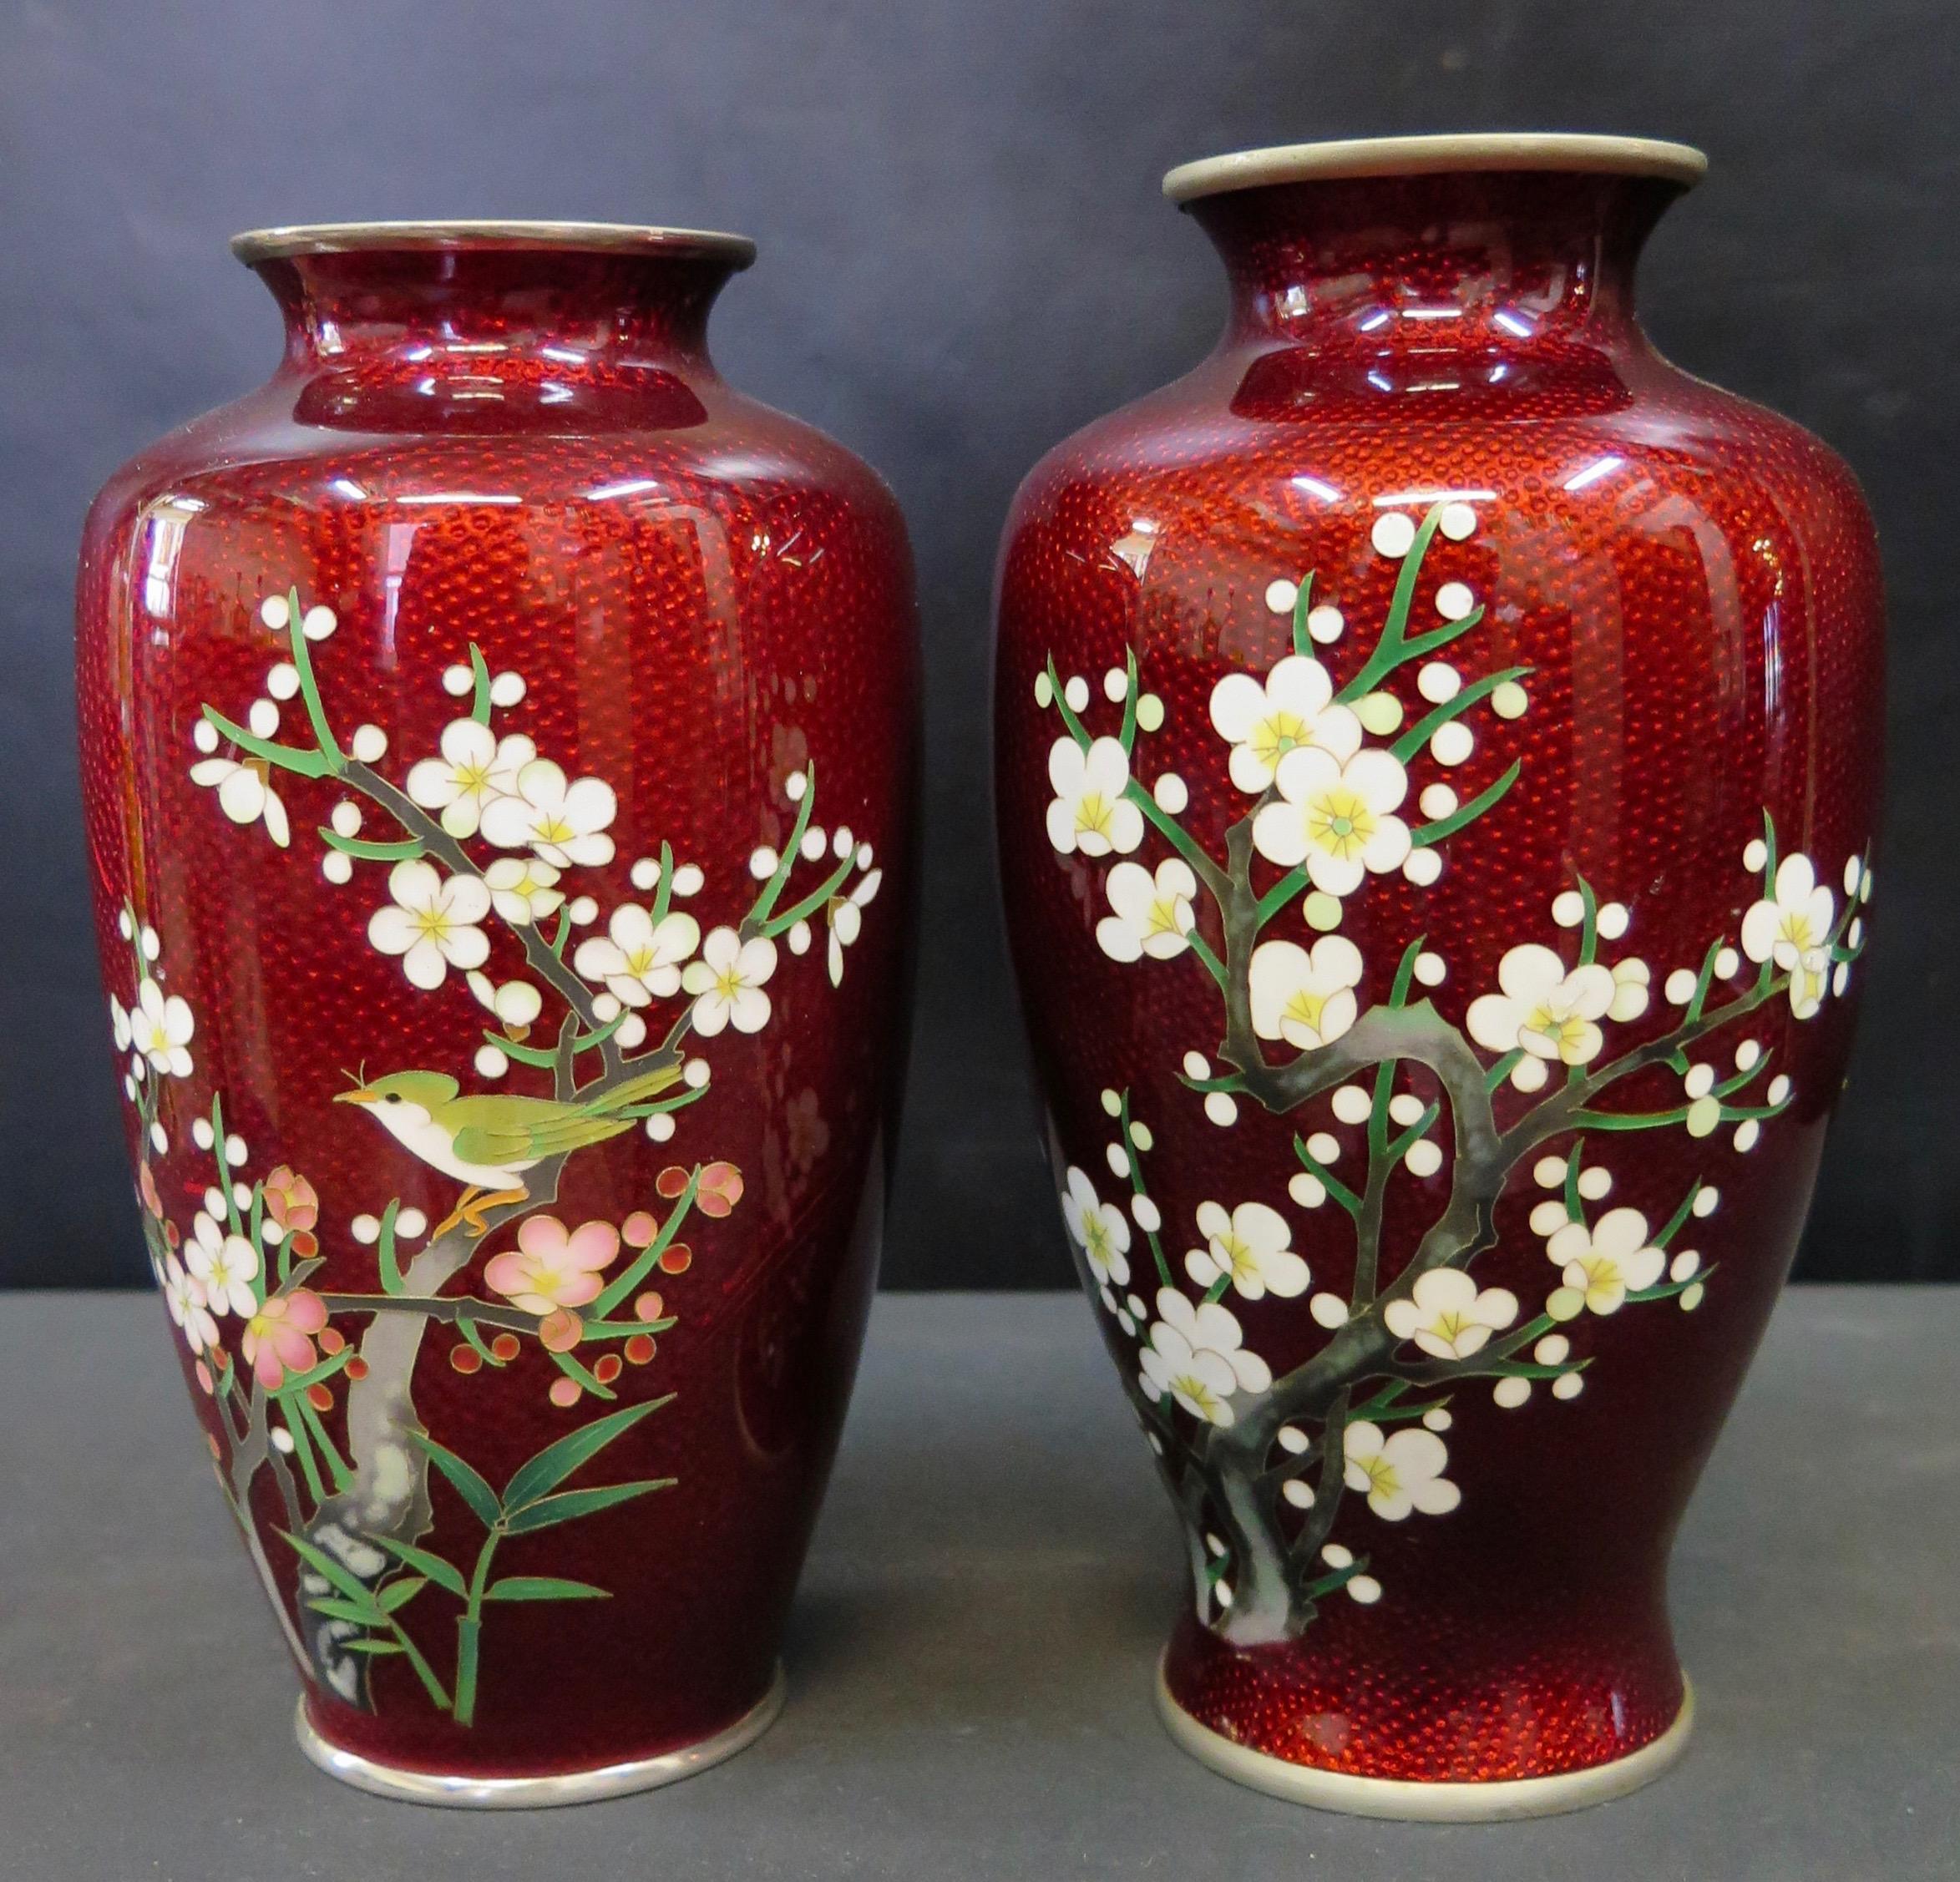 Vintage japanese red enamel vases lawrence j zinzi antiques inc vintage japanese red enamel vases reviewsmspy